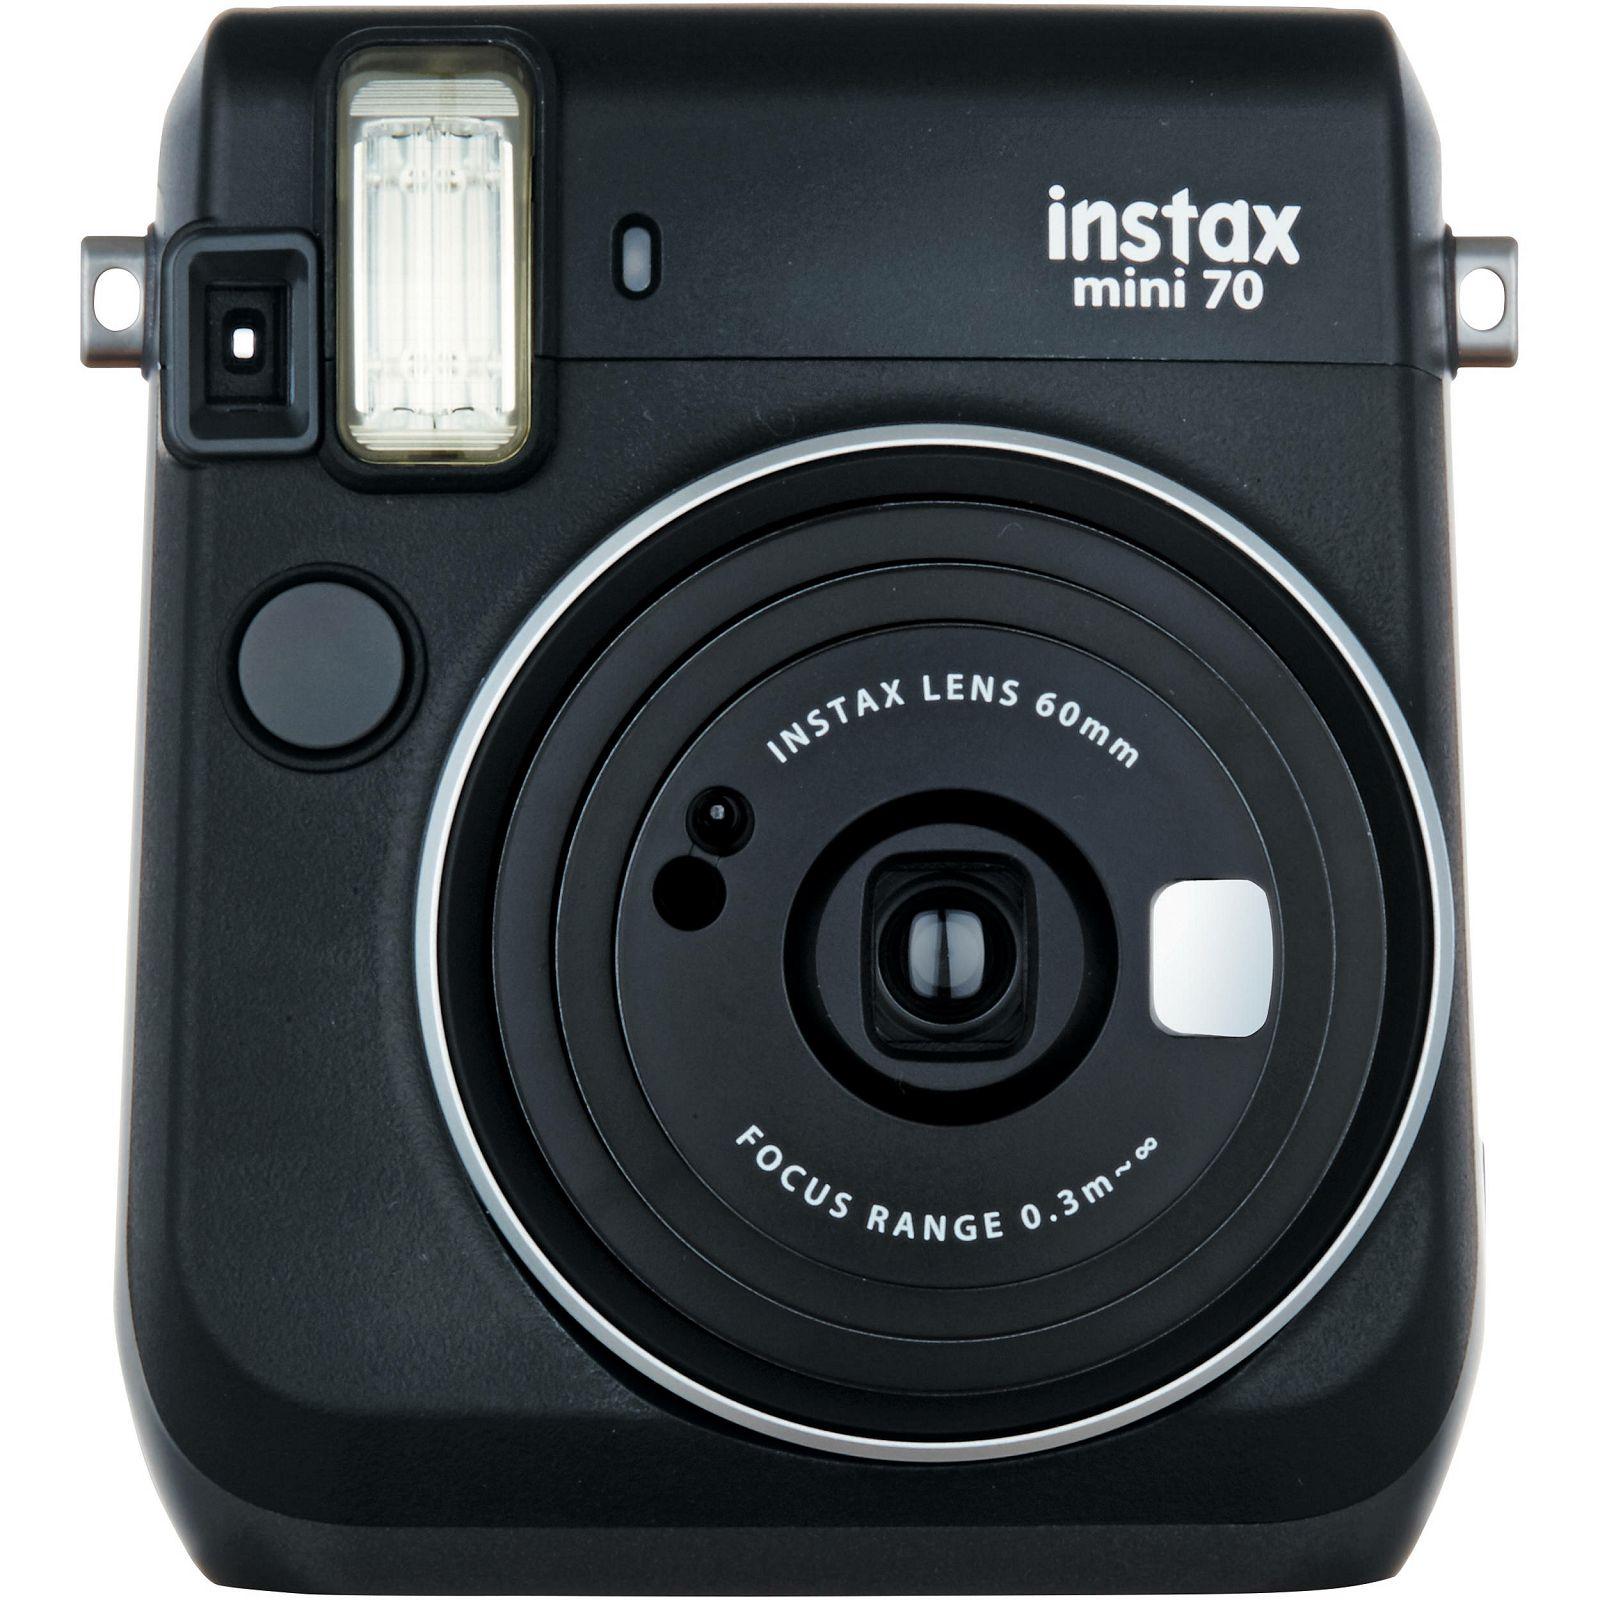 Fujifilm Instax mini 70 Instant Film Camera (Black) Crni Fuji polaroidni fotoaparat s trenutnim ispisom fotografije